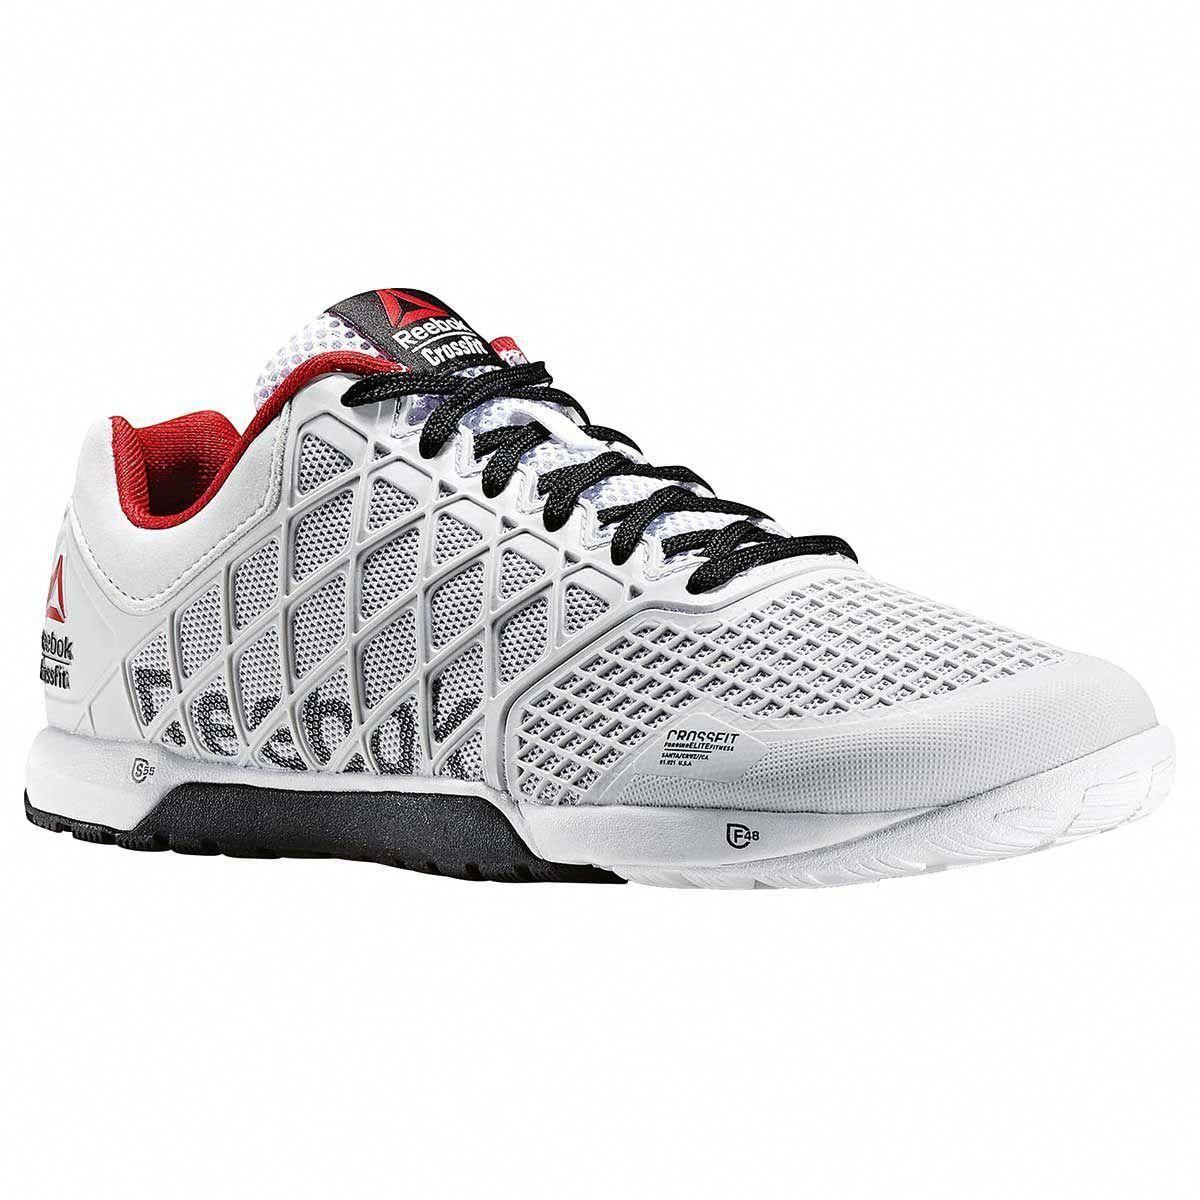 Partido oportunidad Torrente  Reebok CrossFit Nano 4.0 Men's CrossFit Shoes #WorkoutClothing  #tennisoutfit | Mens crossfit shoes, Crossfit shoes, Reebok crossfit nano